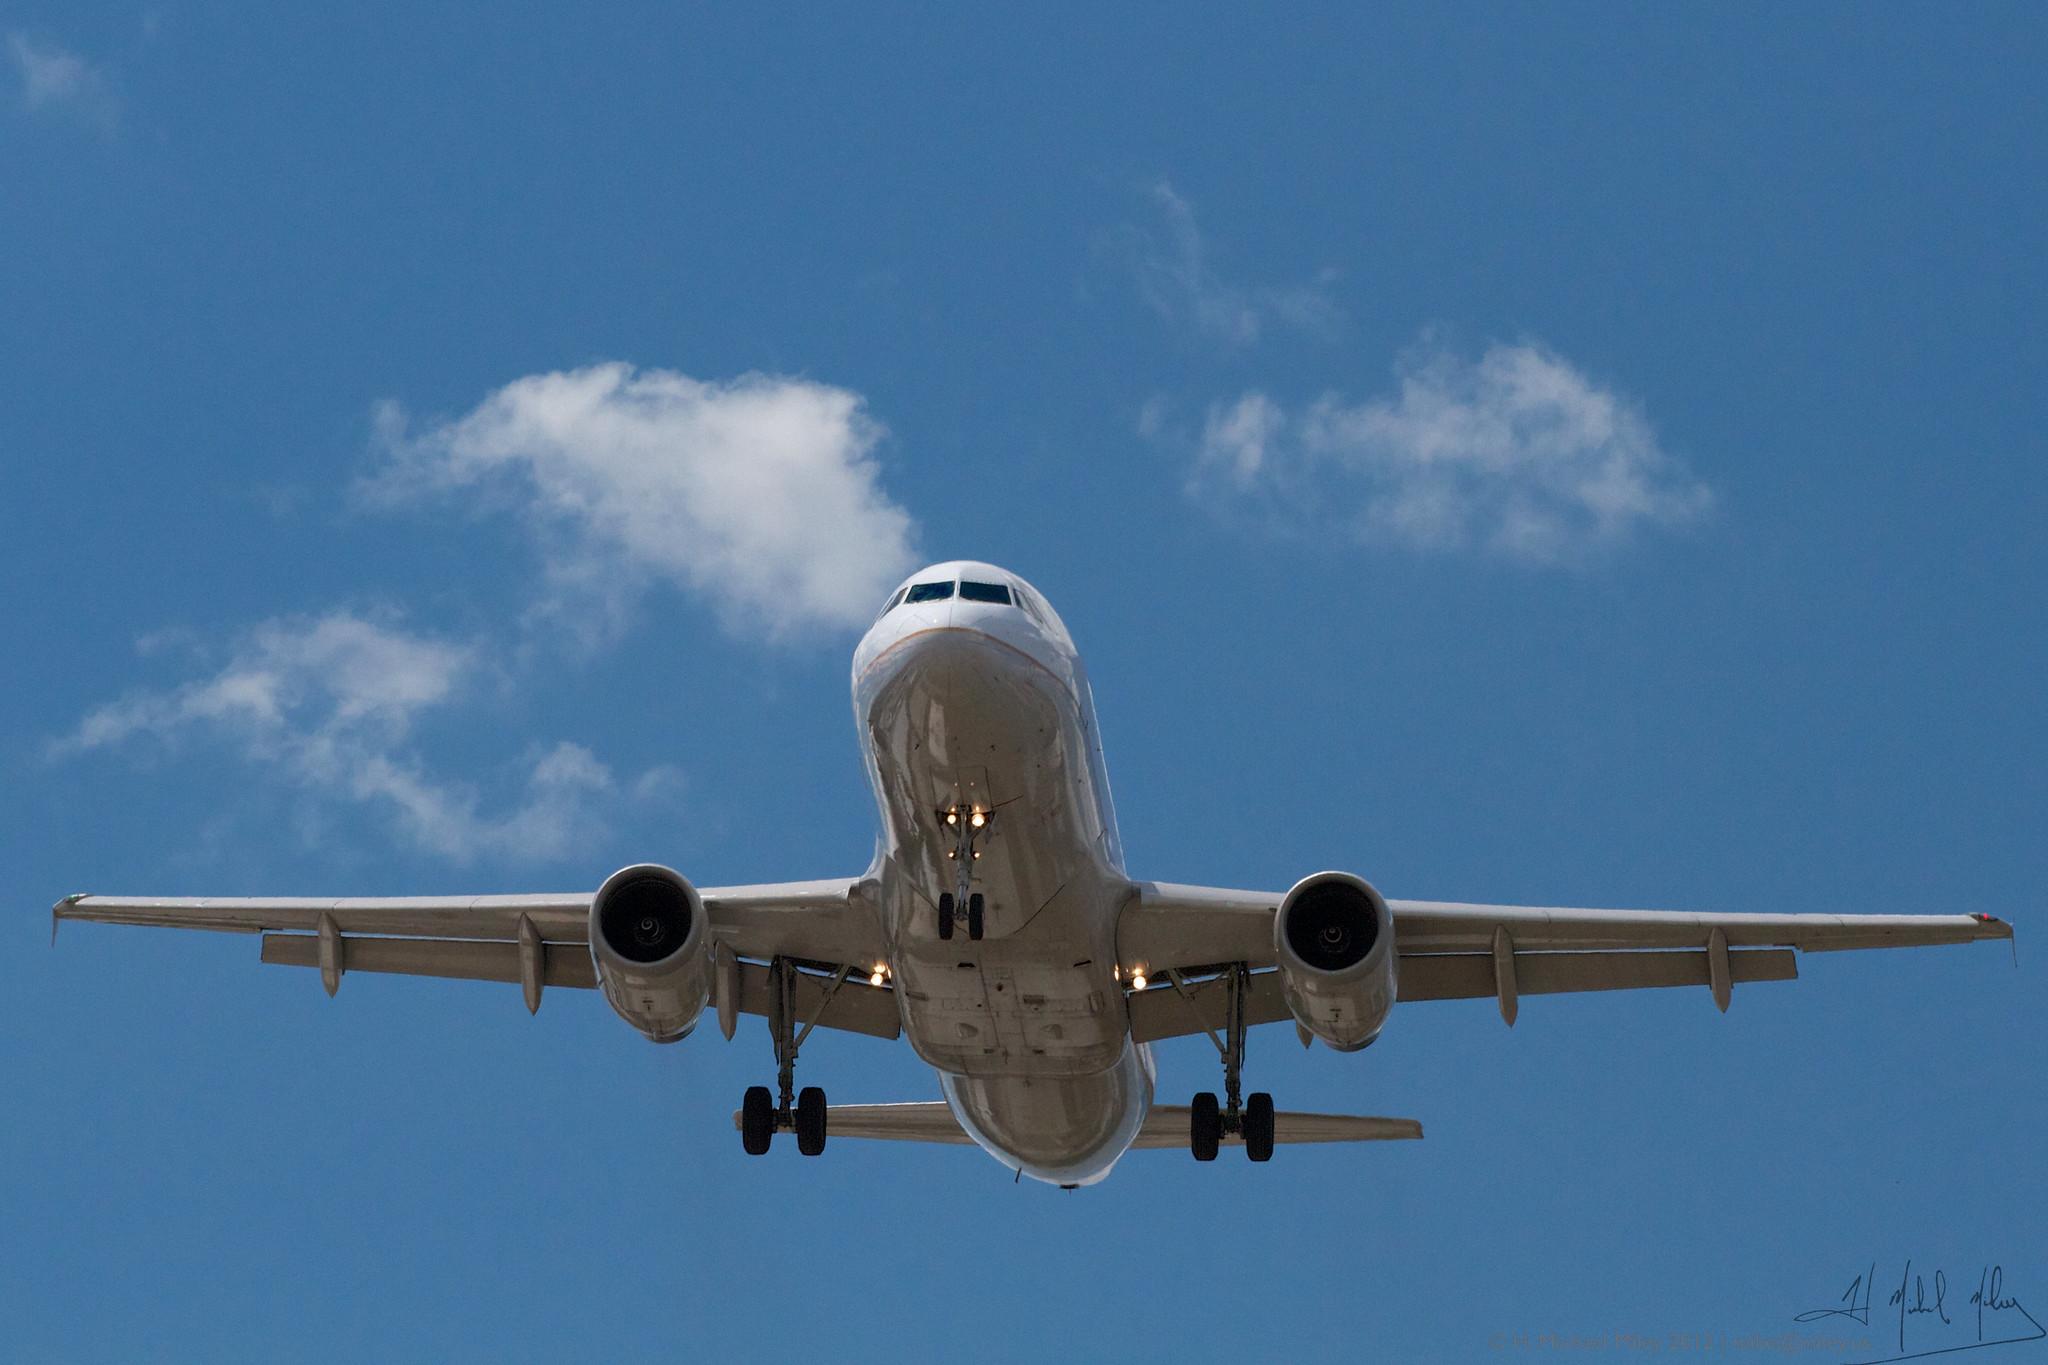 Plane Spotting at ORD